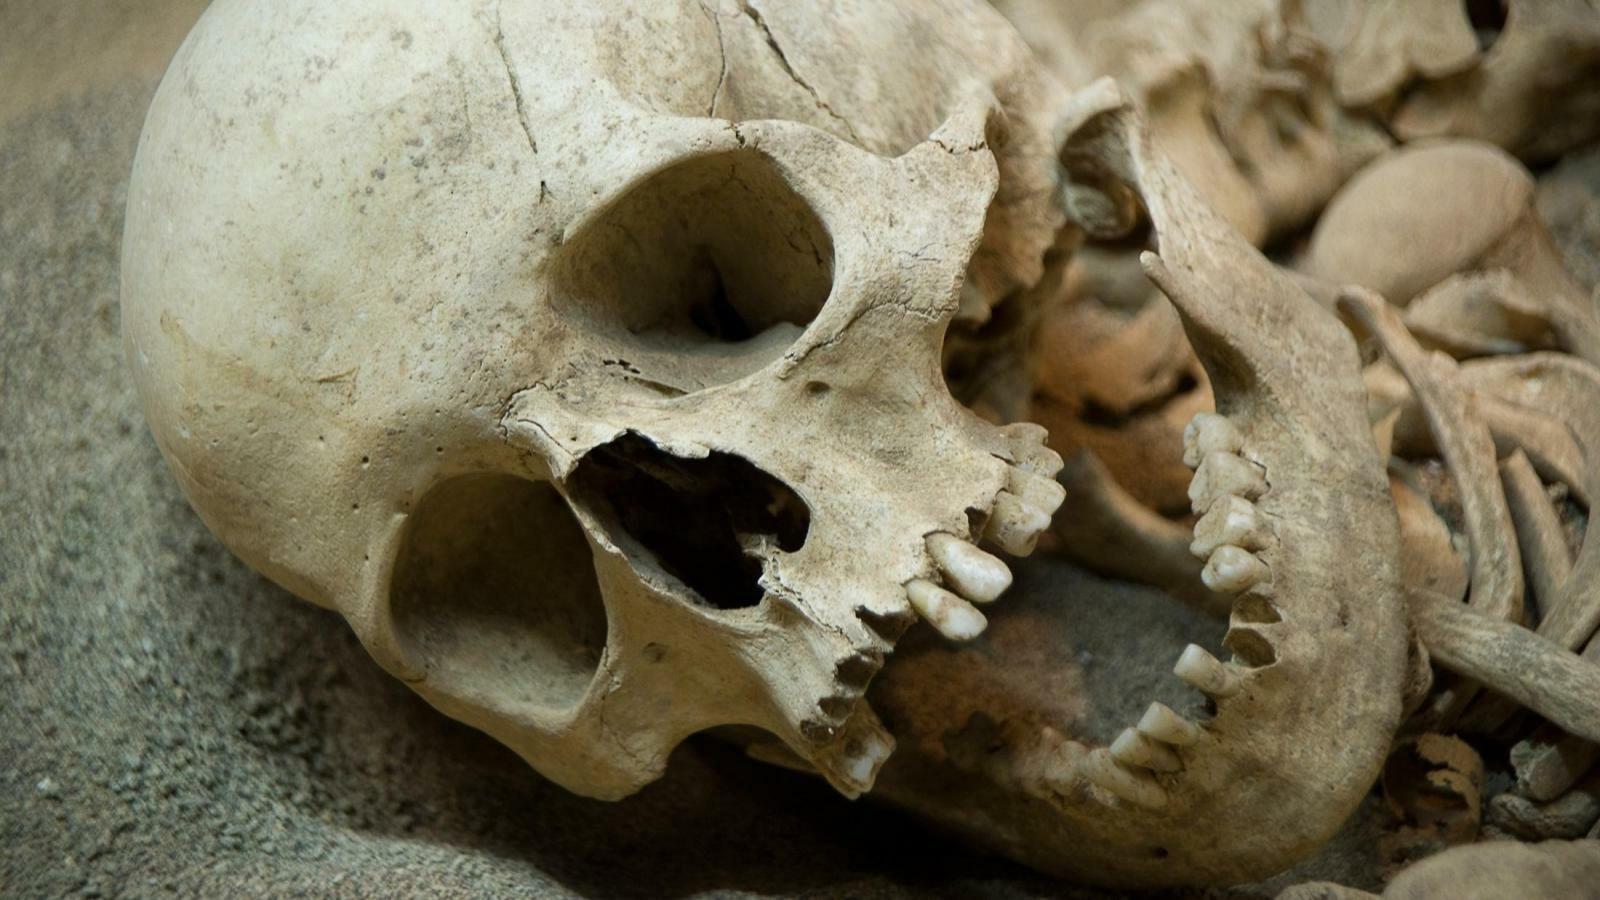 Три человеческих черепа и кости нашли на